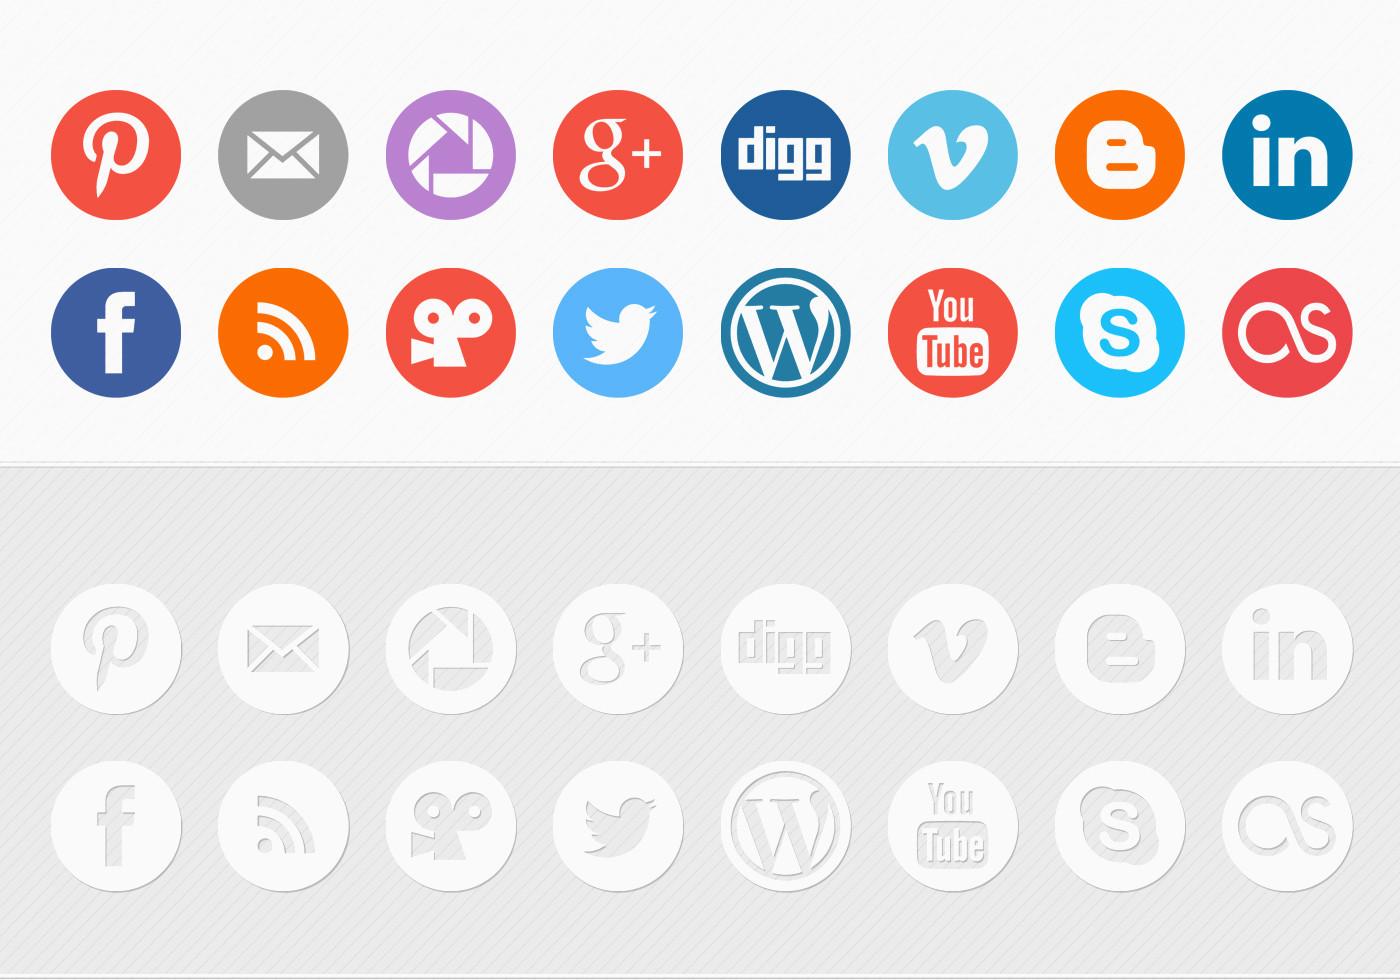 1400x980 Facebook Icon Vector Inspirational Icon Vector Free Downloads 3axid